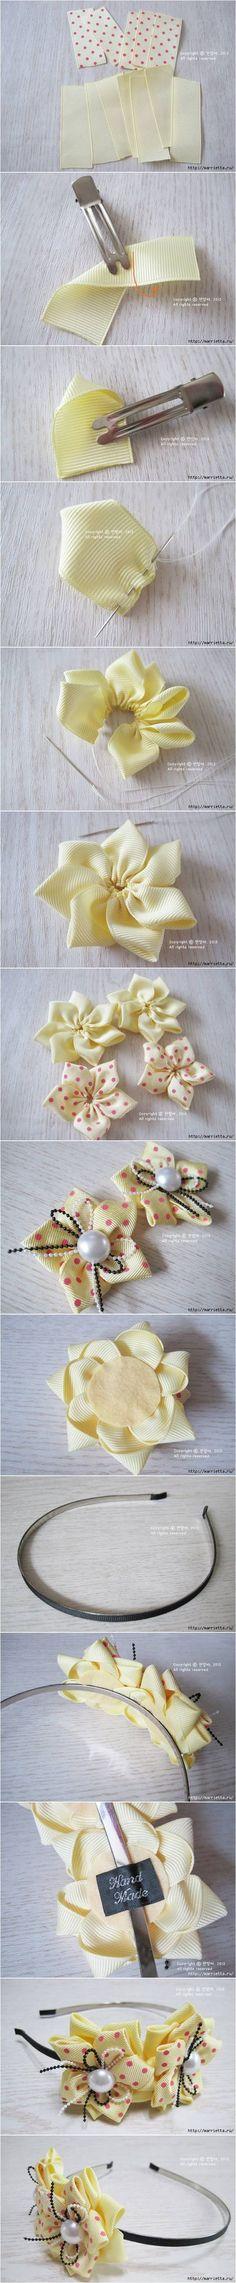 How to DIY Elegant Ribbon Flower Hairband #craft #ribbon #flower